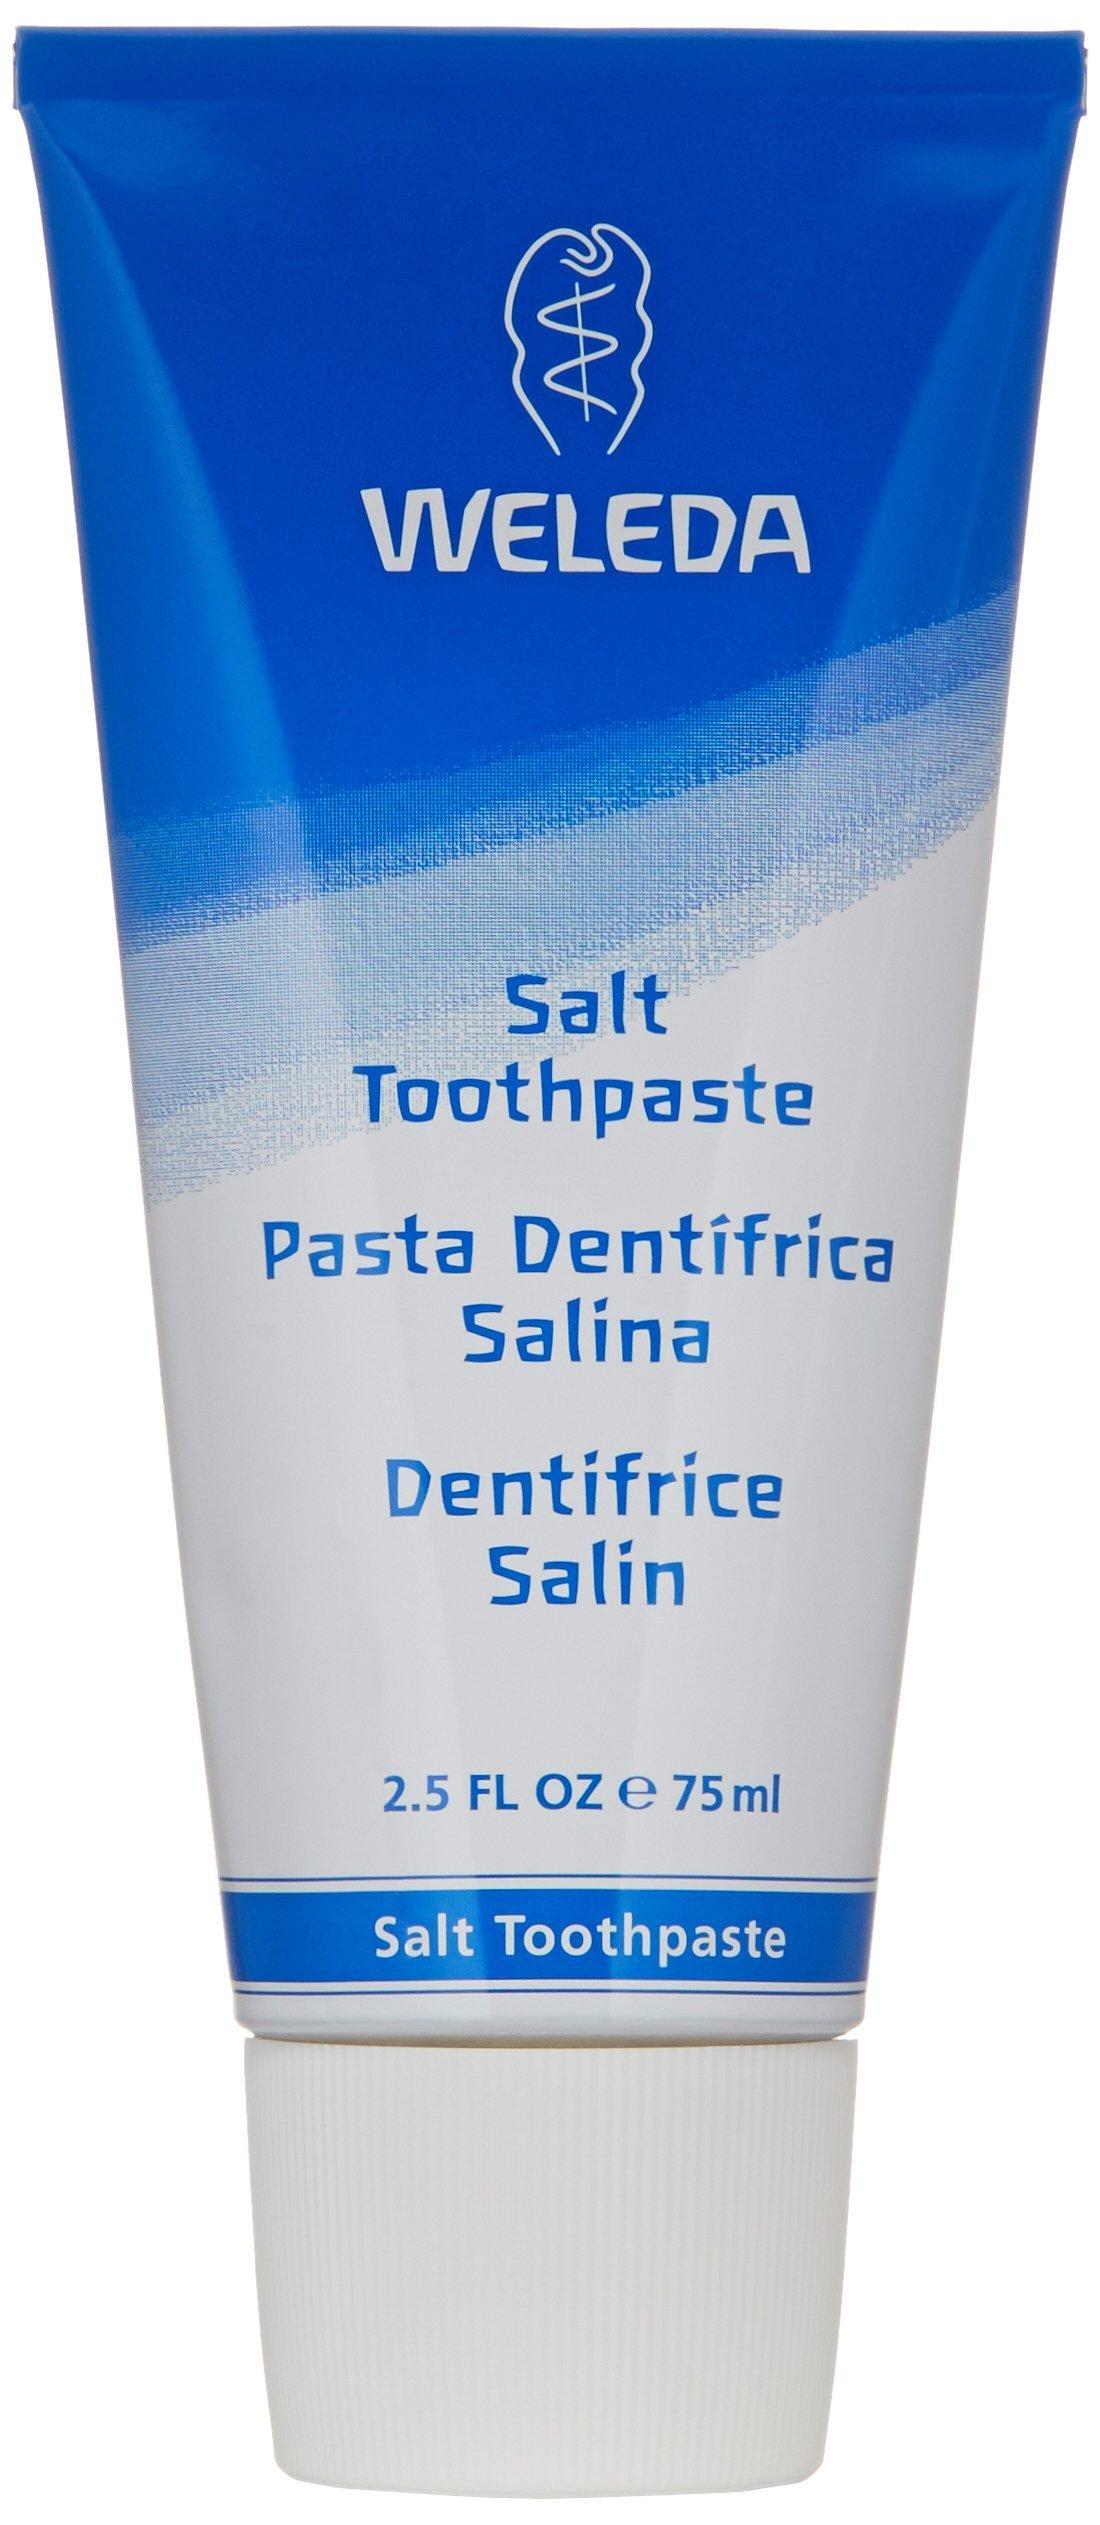 Weleda: Natural Salt Toothpaste, 2.5 oz